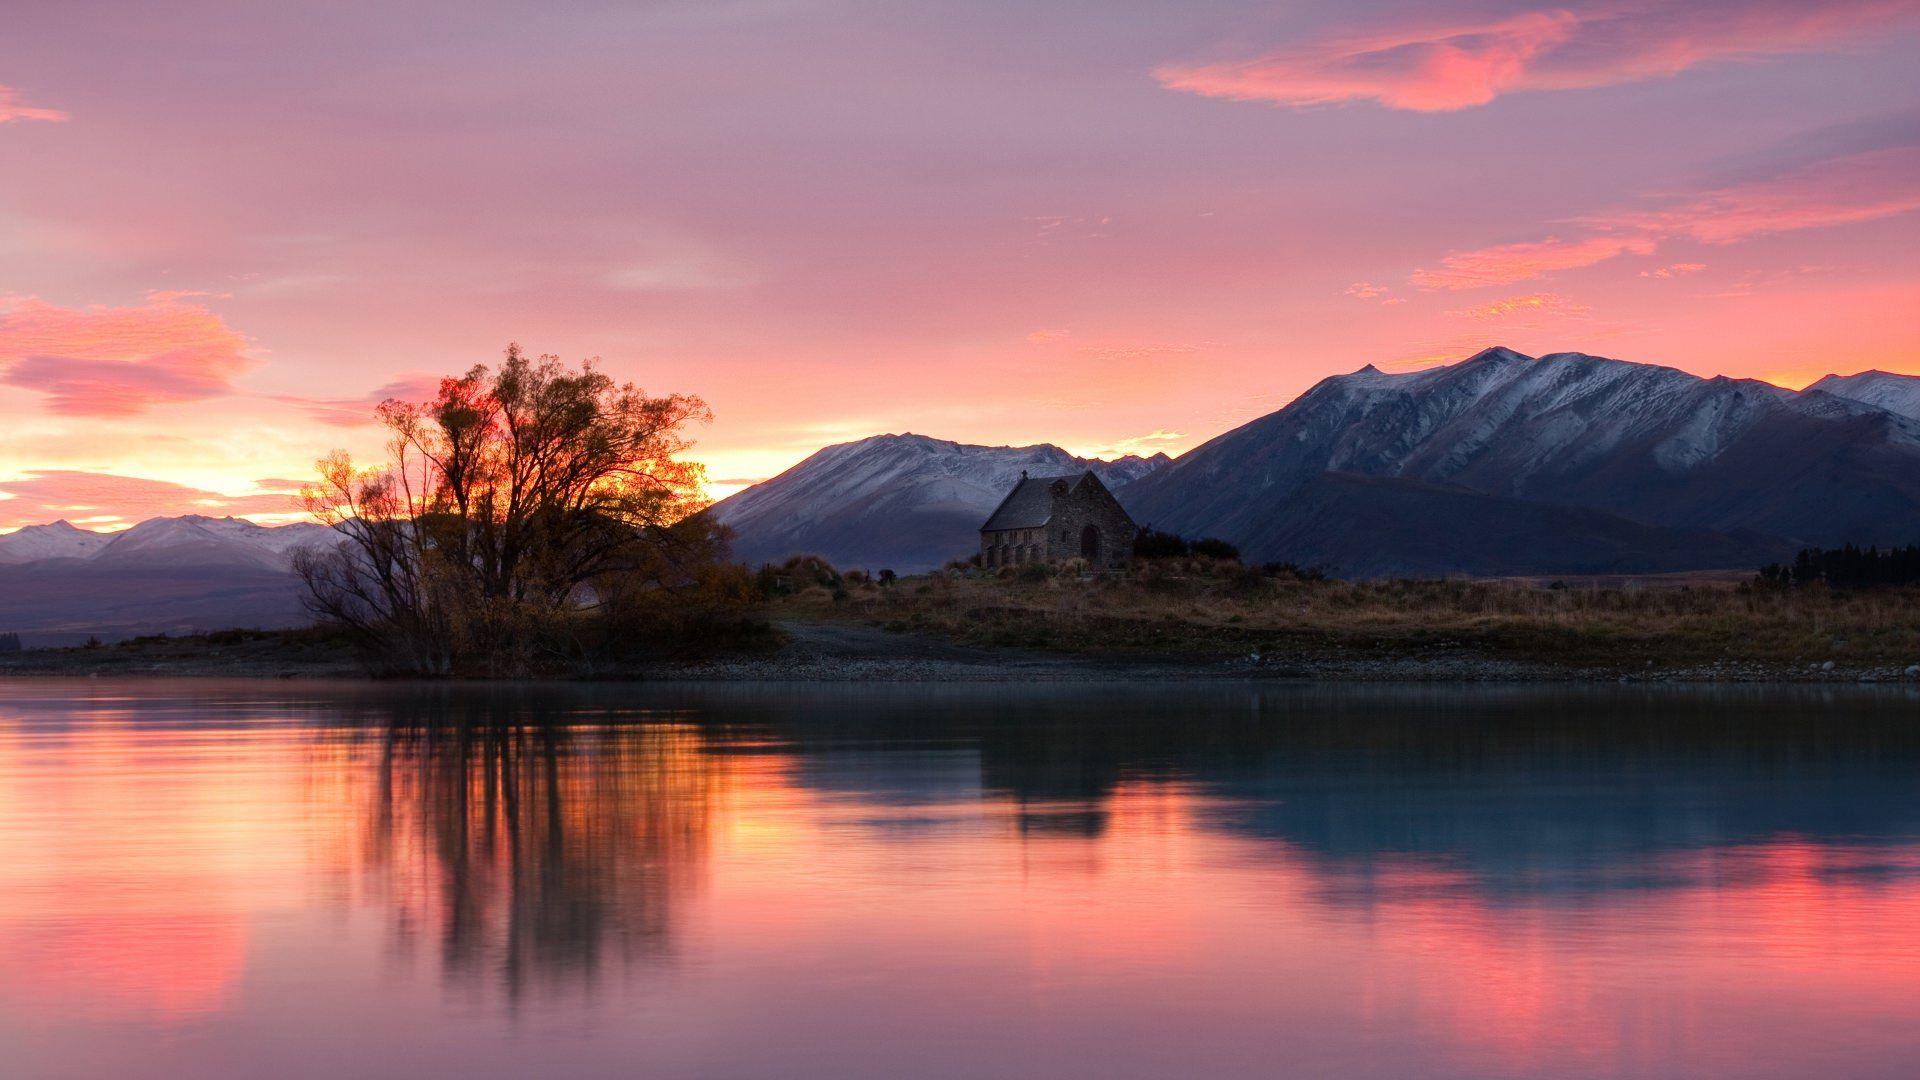 Sunrise Wallpapers Sunrays Backgrounds Images FreeCreatives